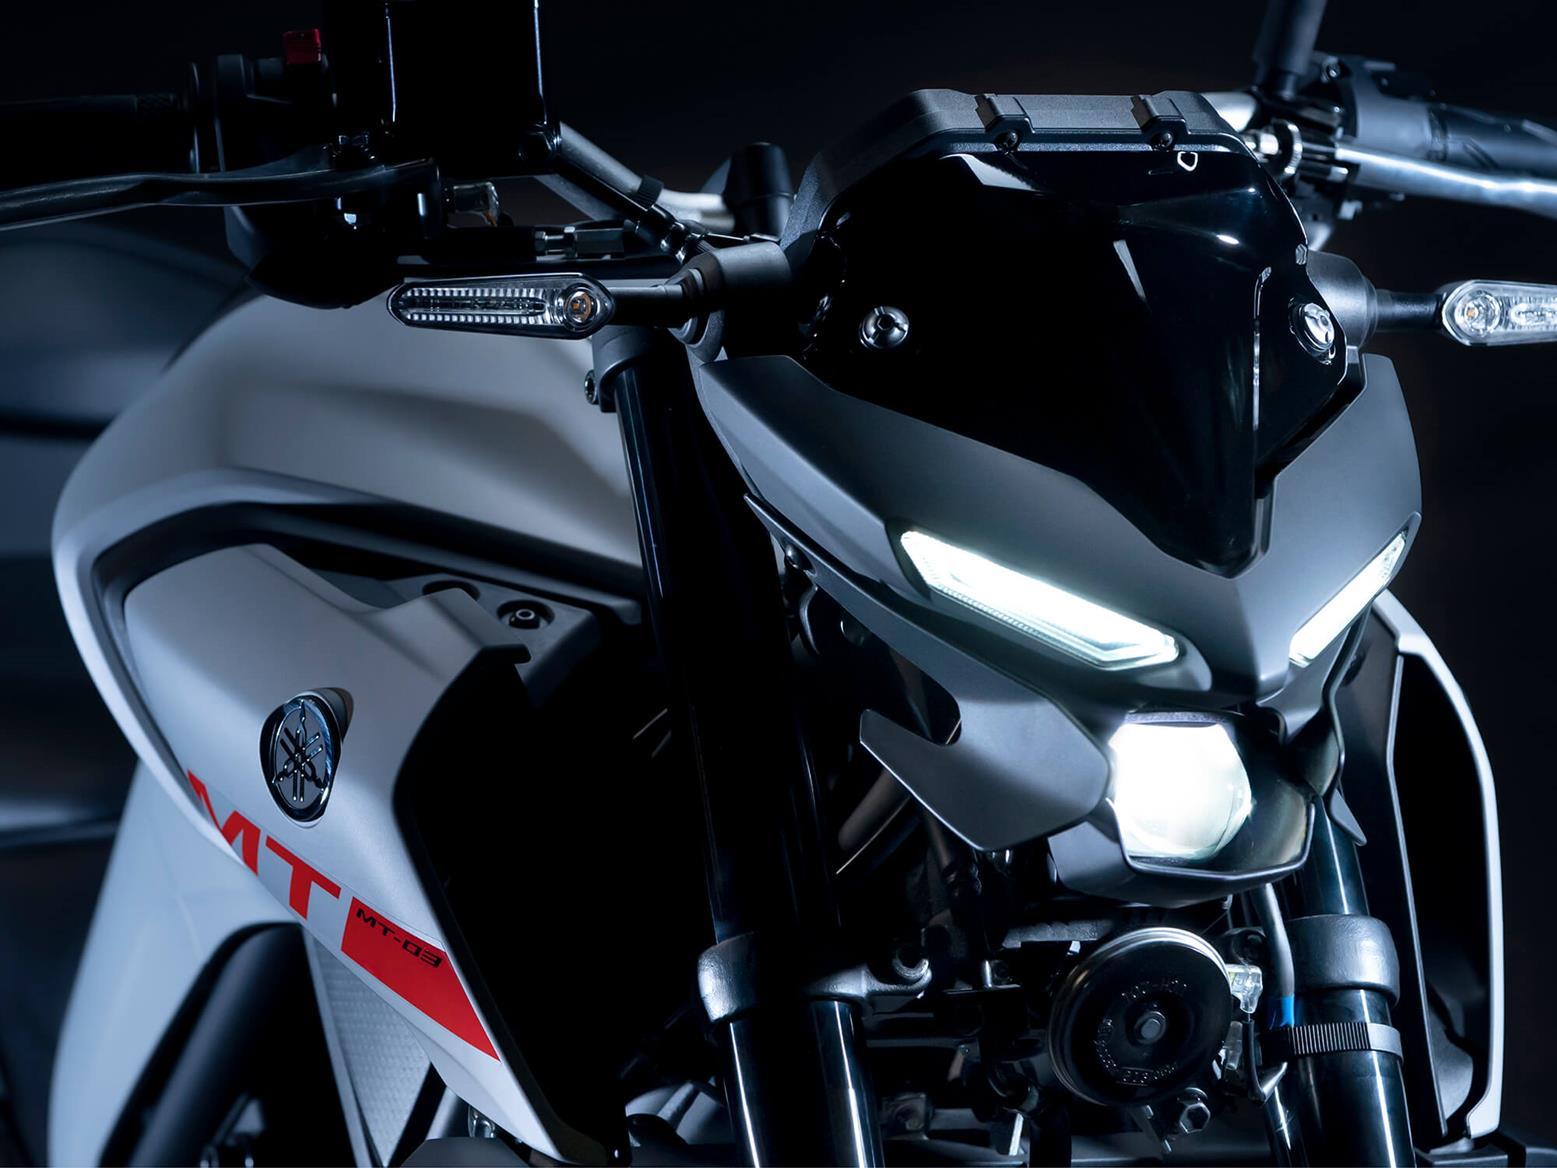 2020 Yamaha MT-03 headlight